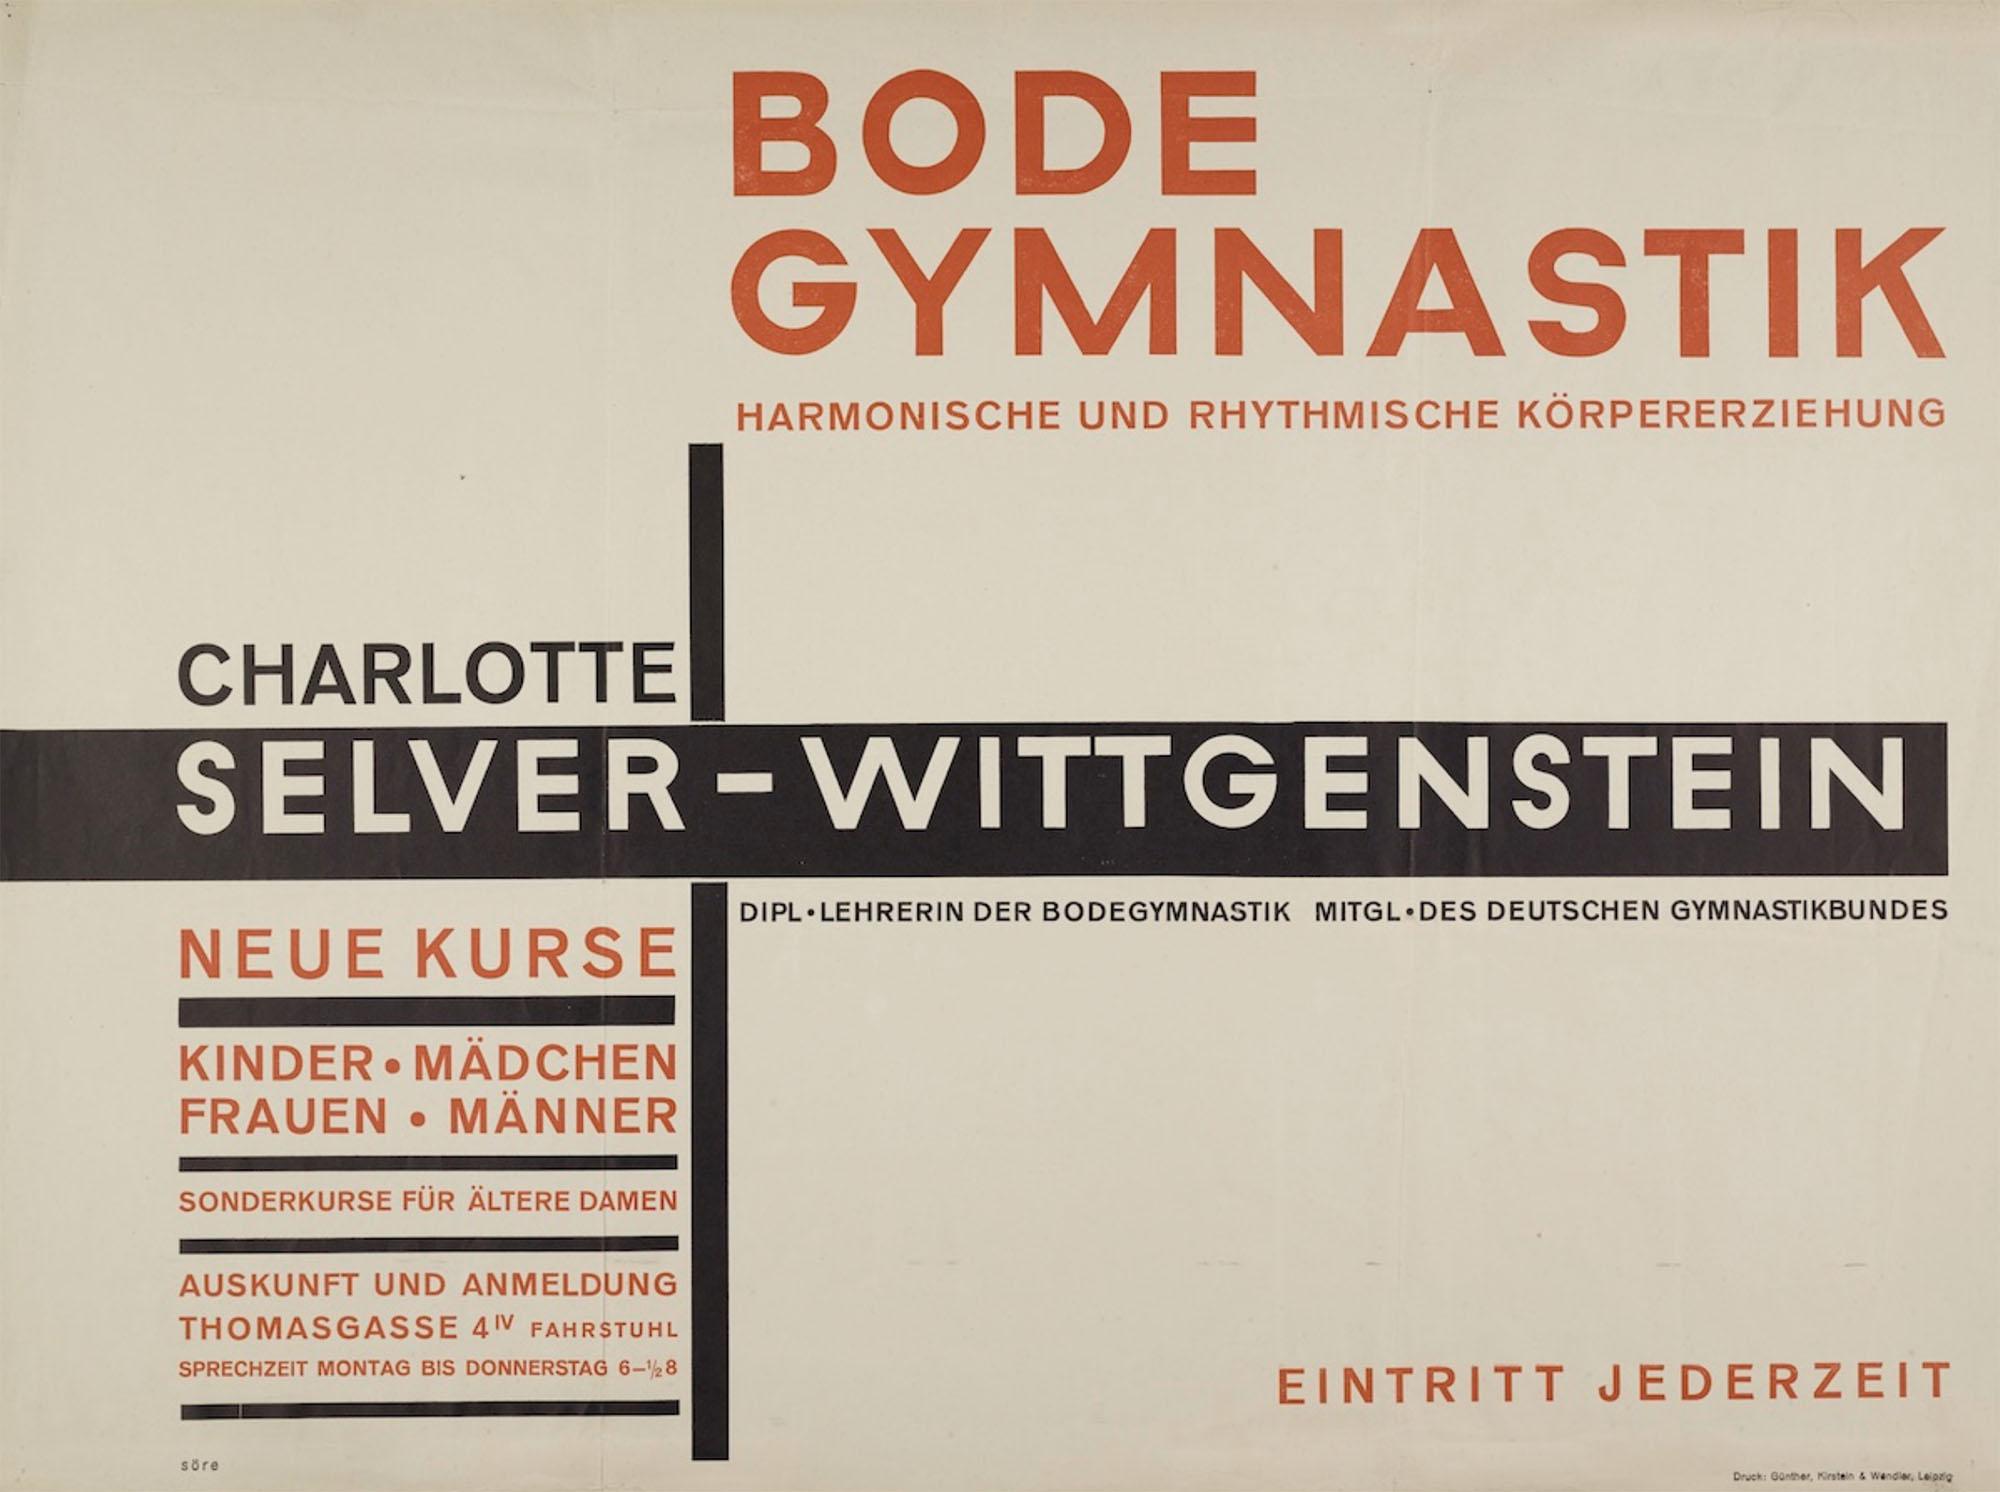 Söre Popitz poster design 1930 Bauhaus Dessau Foundation